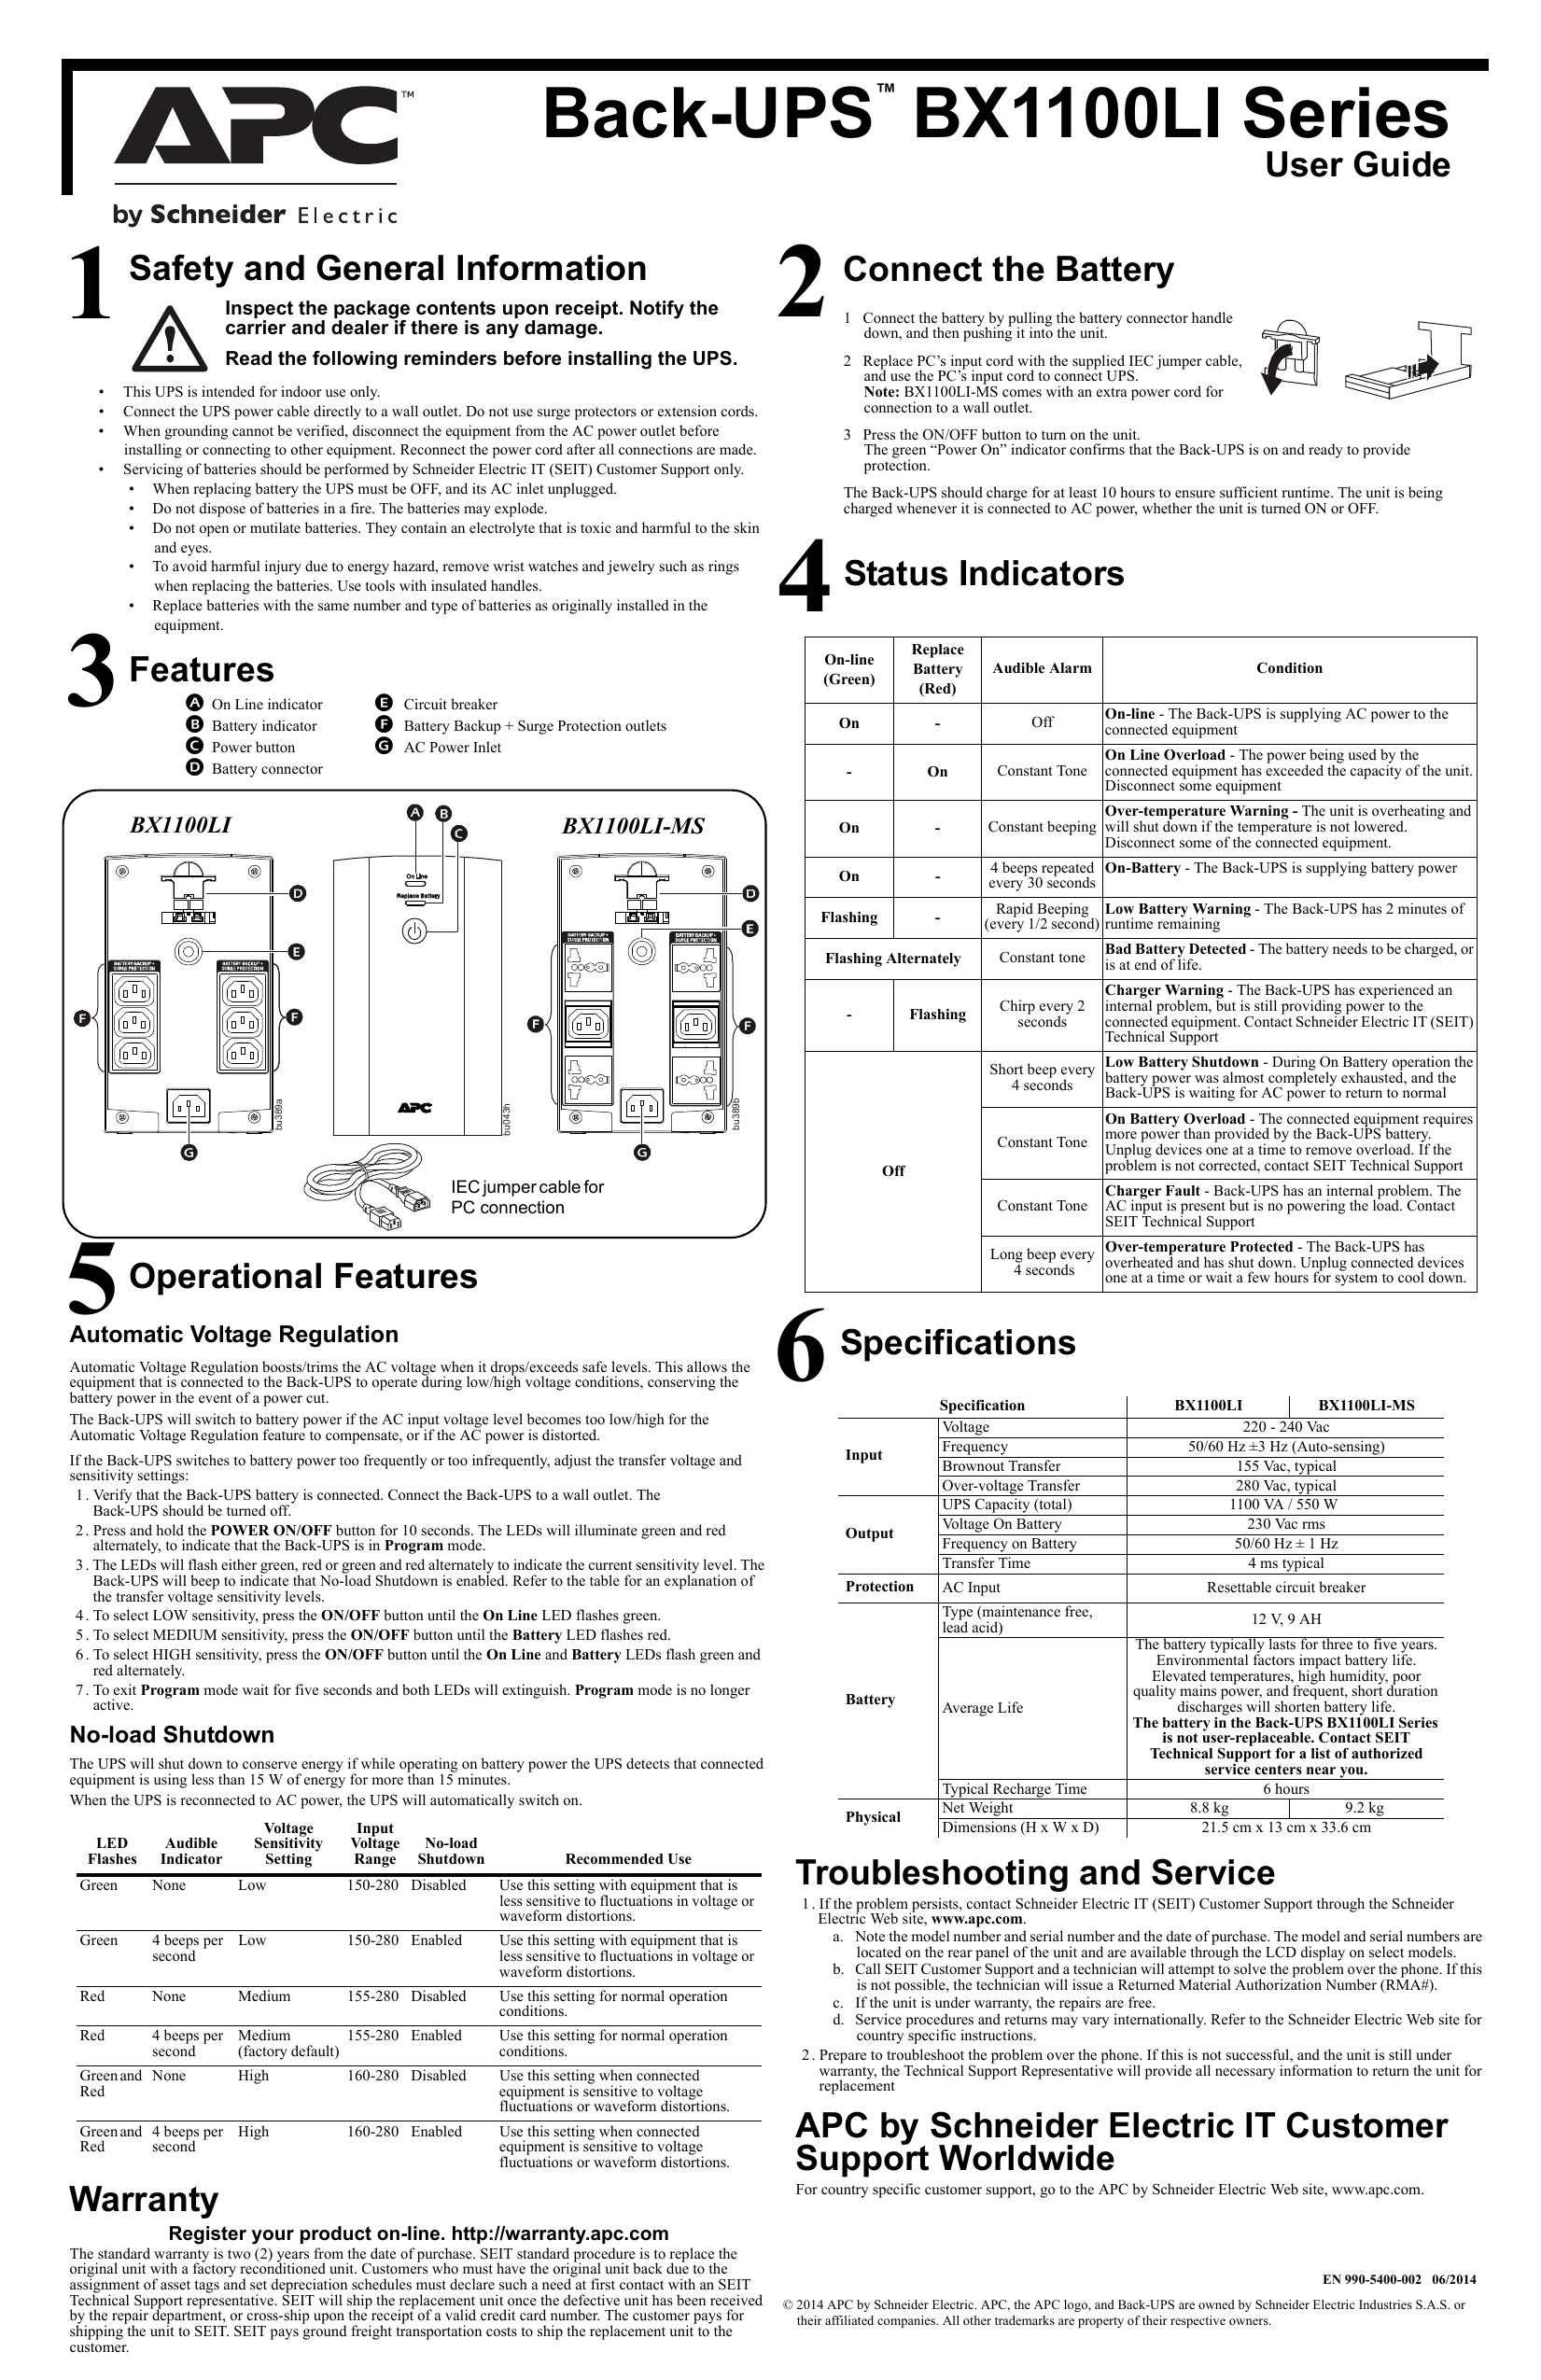 Back-UPS BX1100LI Series | manualzz com